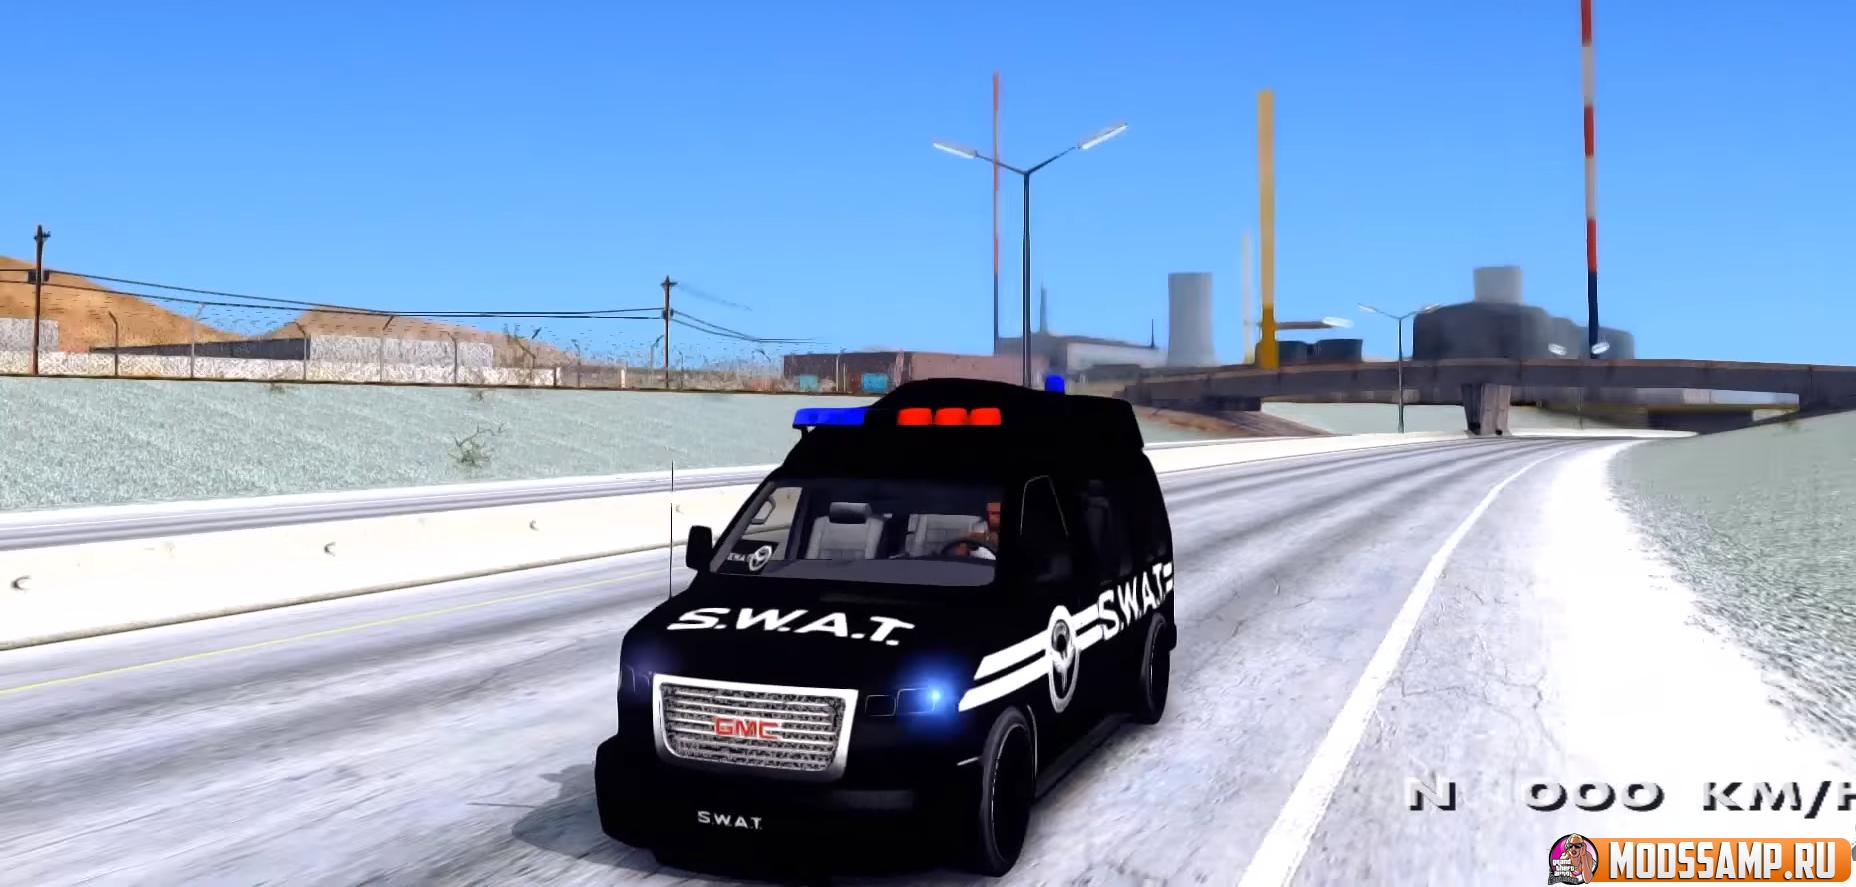 Police Enfocer для GTA:SA